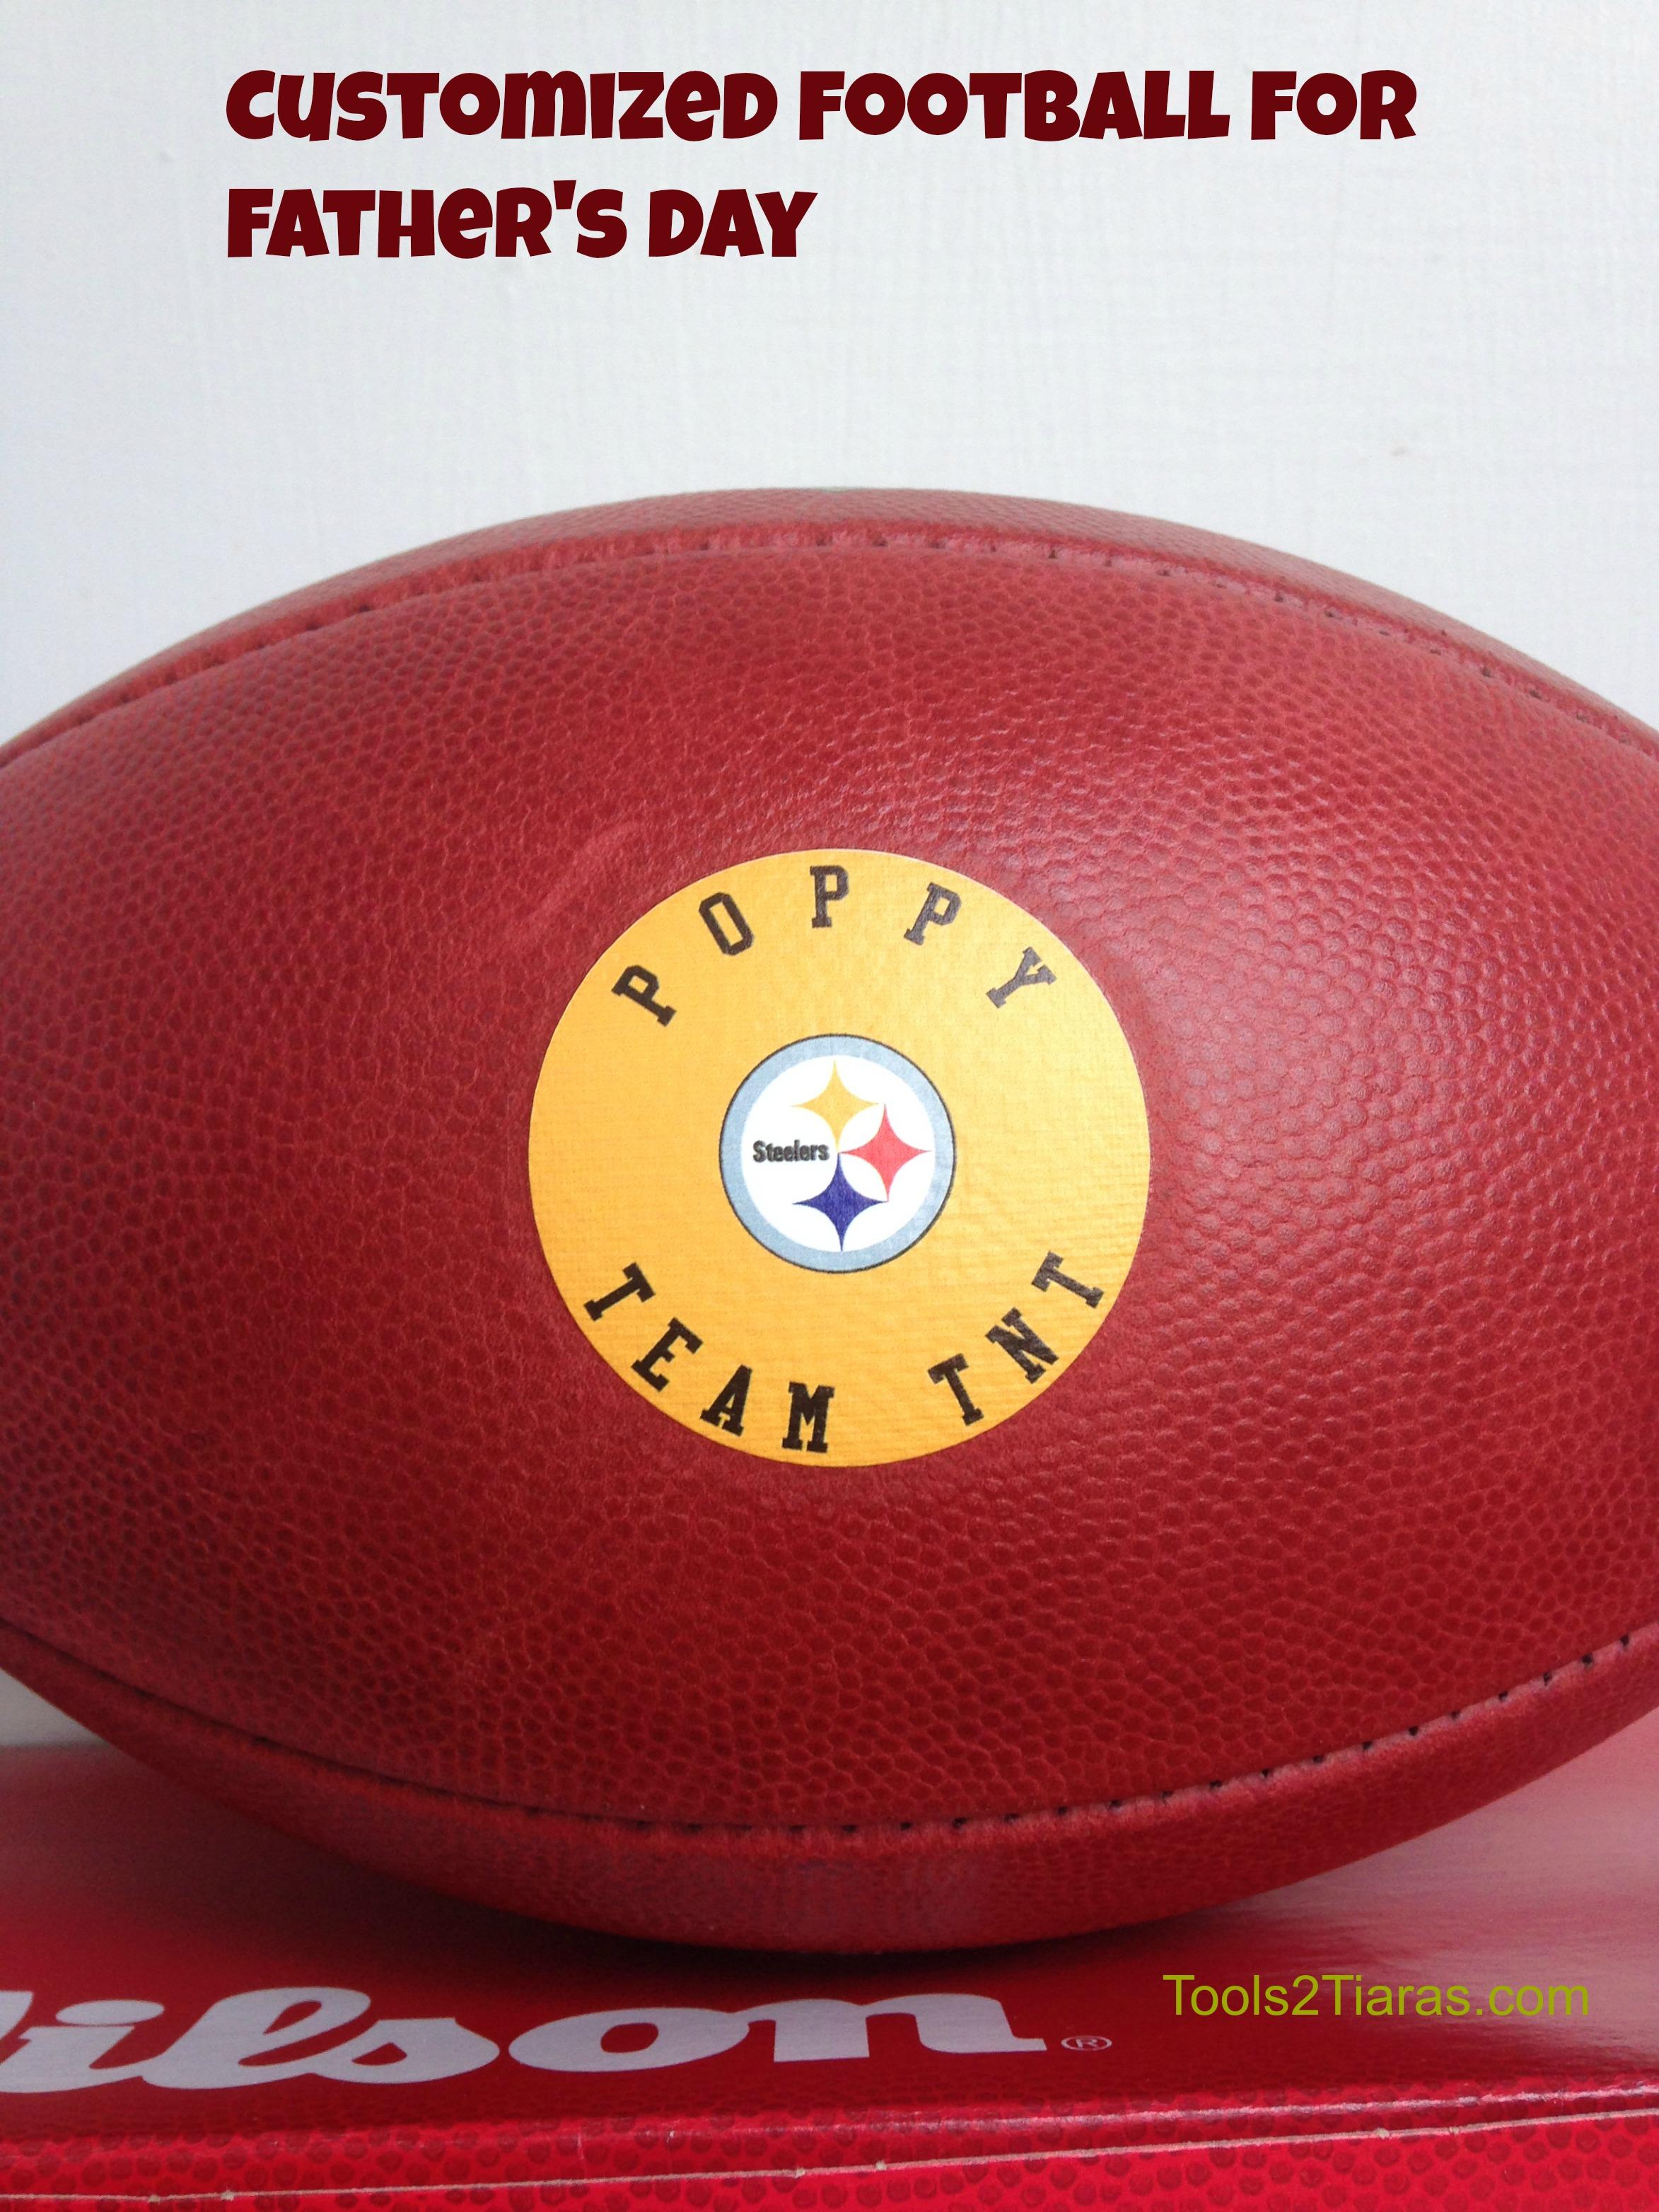 Customized Football